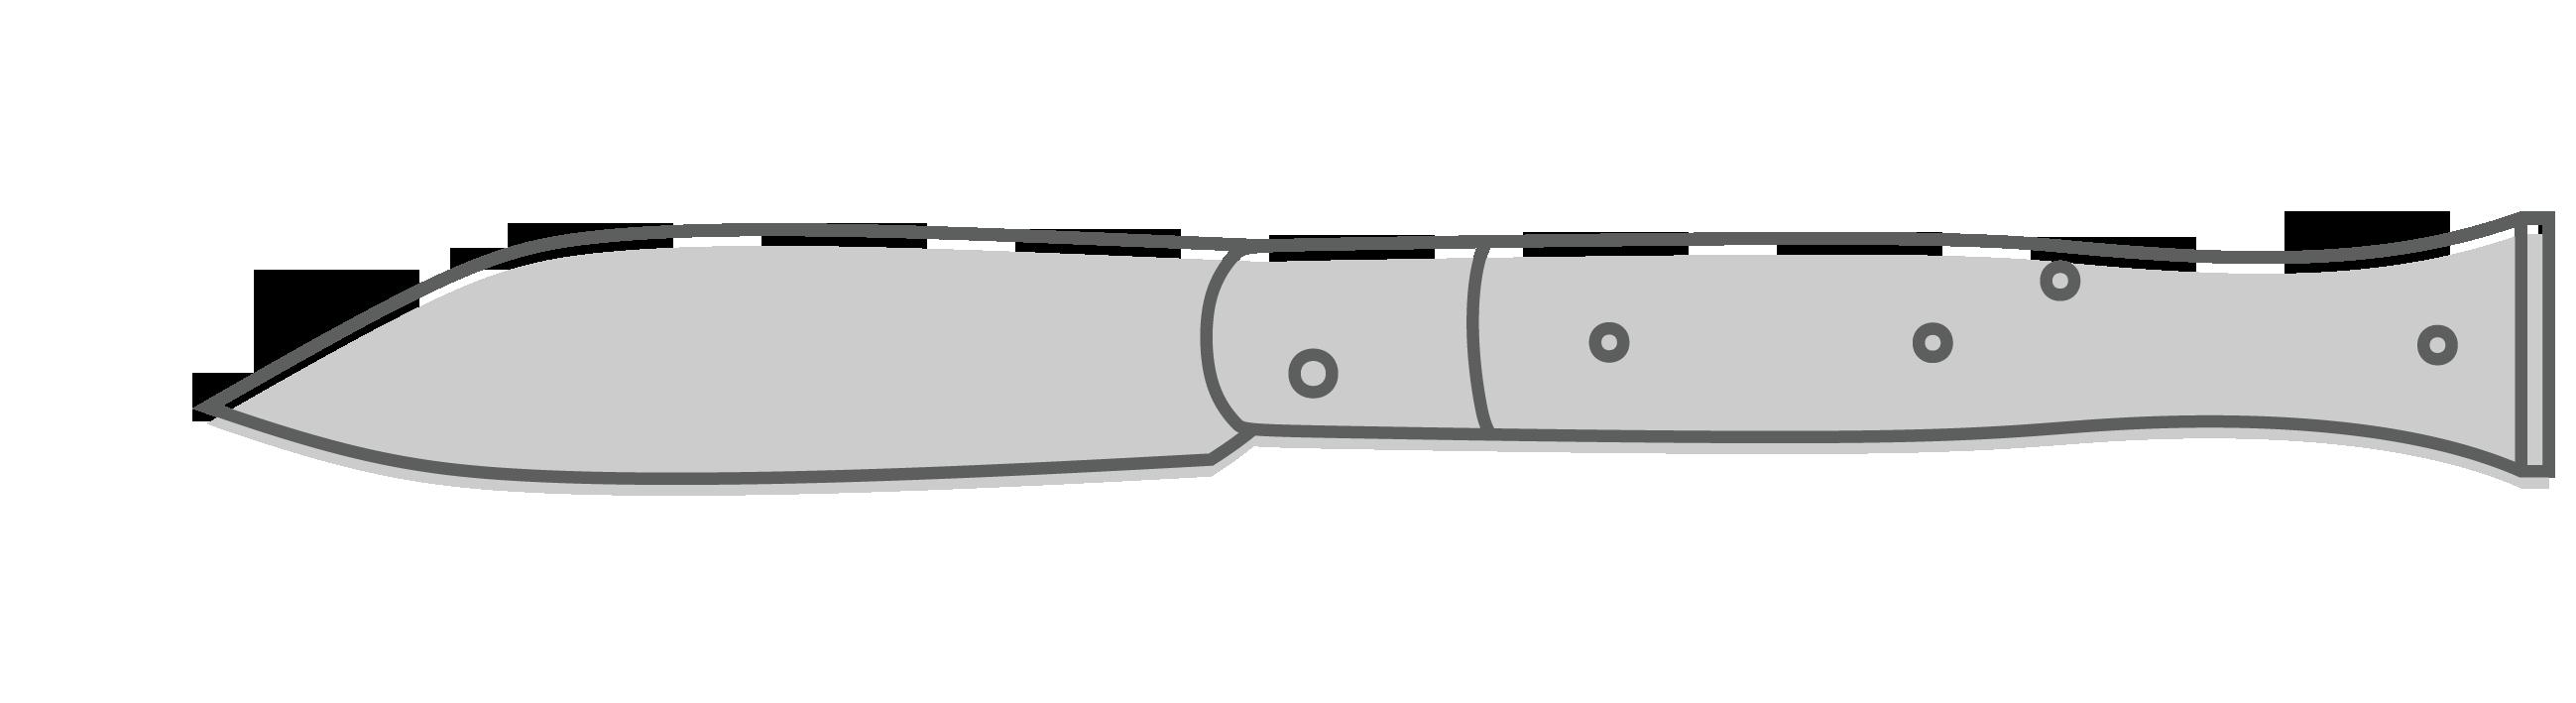 Poisson-Culot